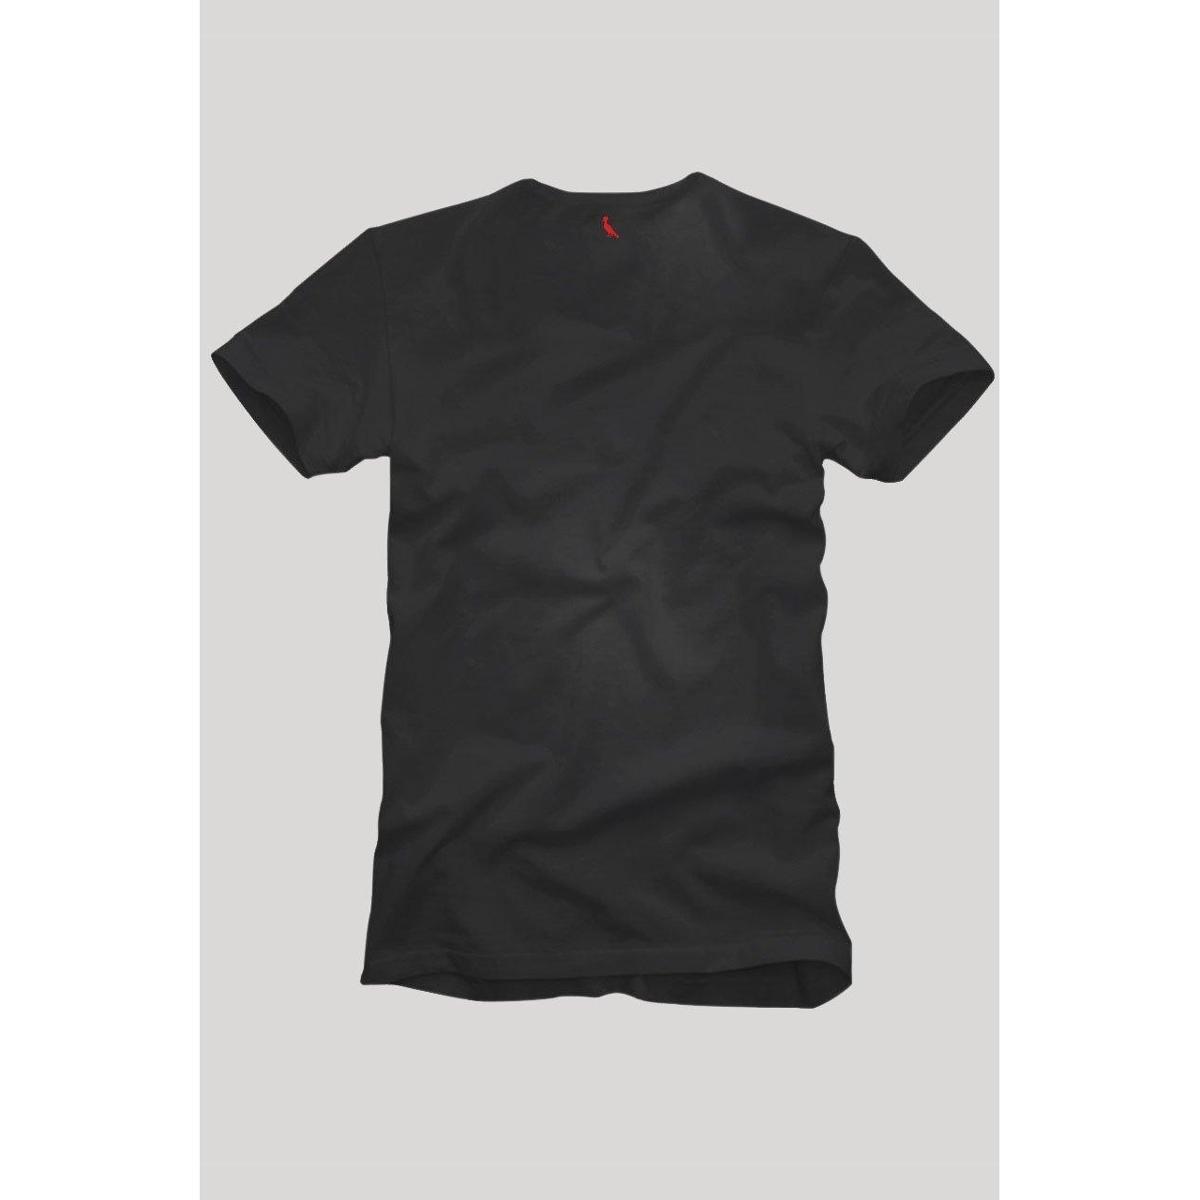 Camiseta Reserva Zico 87 Masculina - Preto